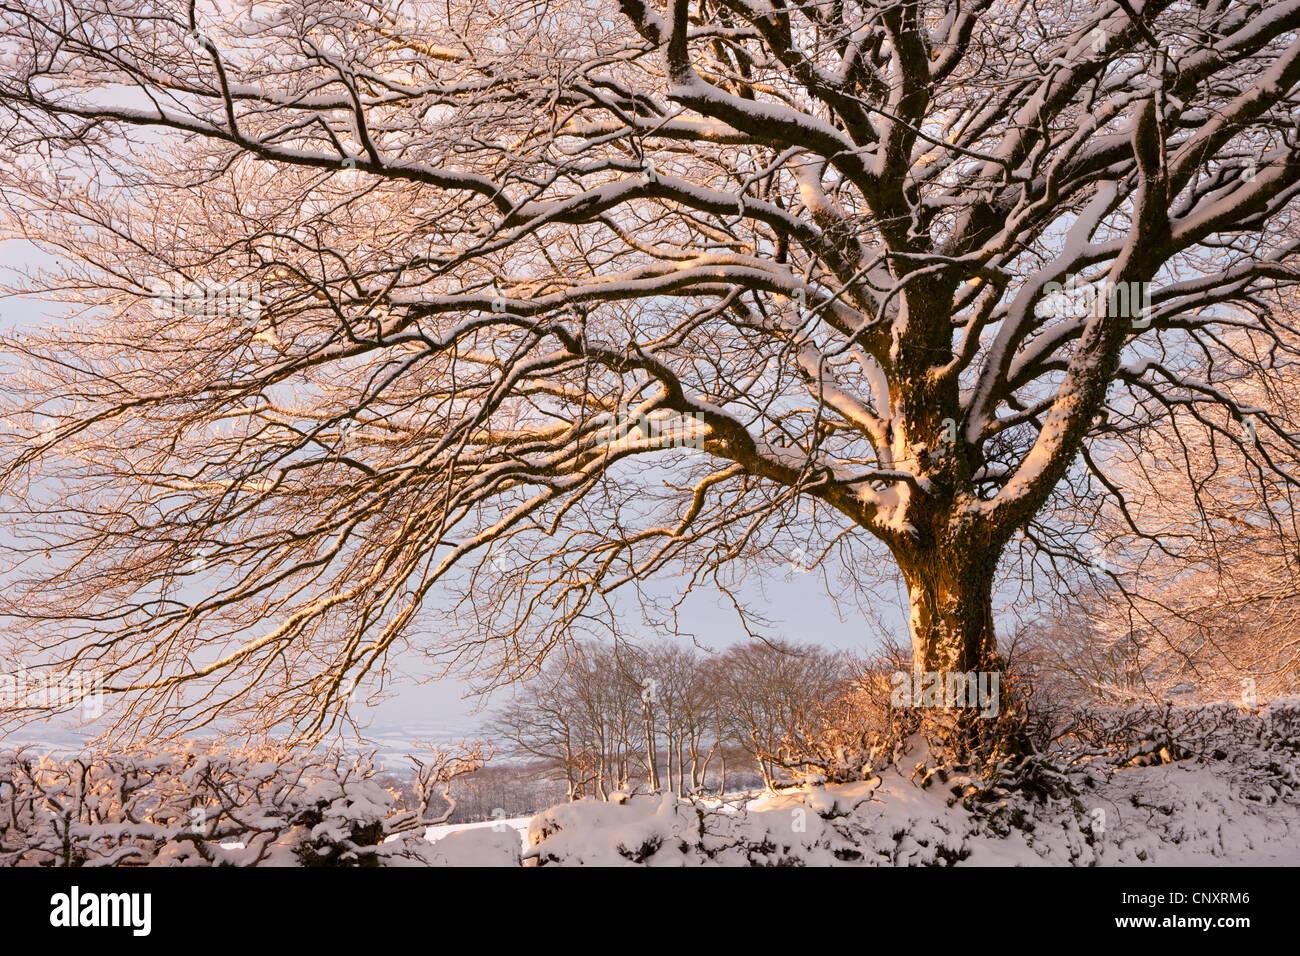 Snow covered tree on Exmoor, Somerset, England. Winter (January) 2012. - Stock Image